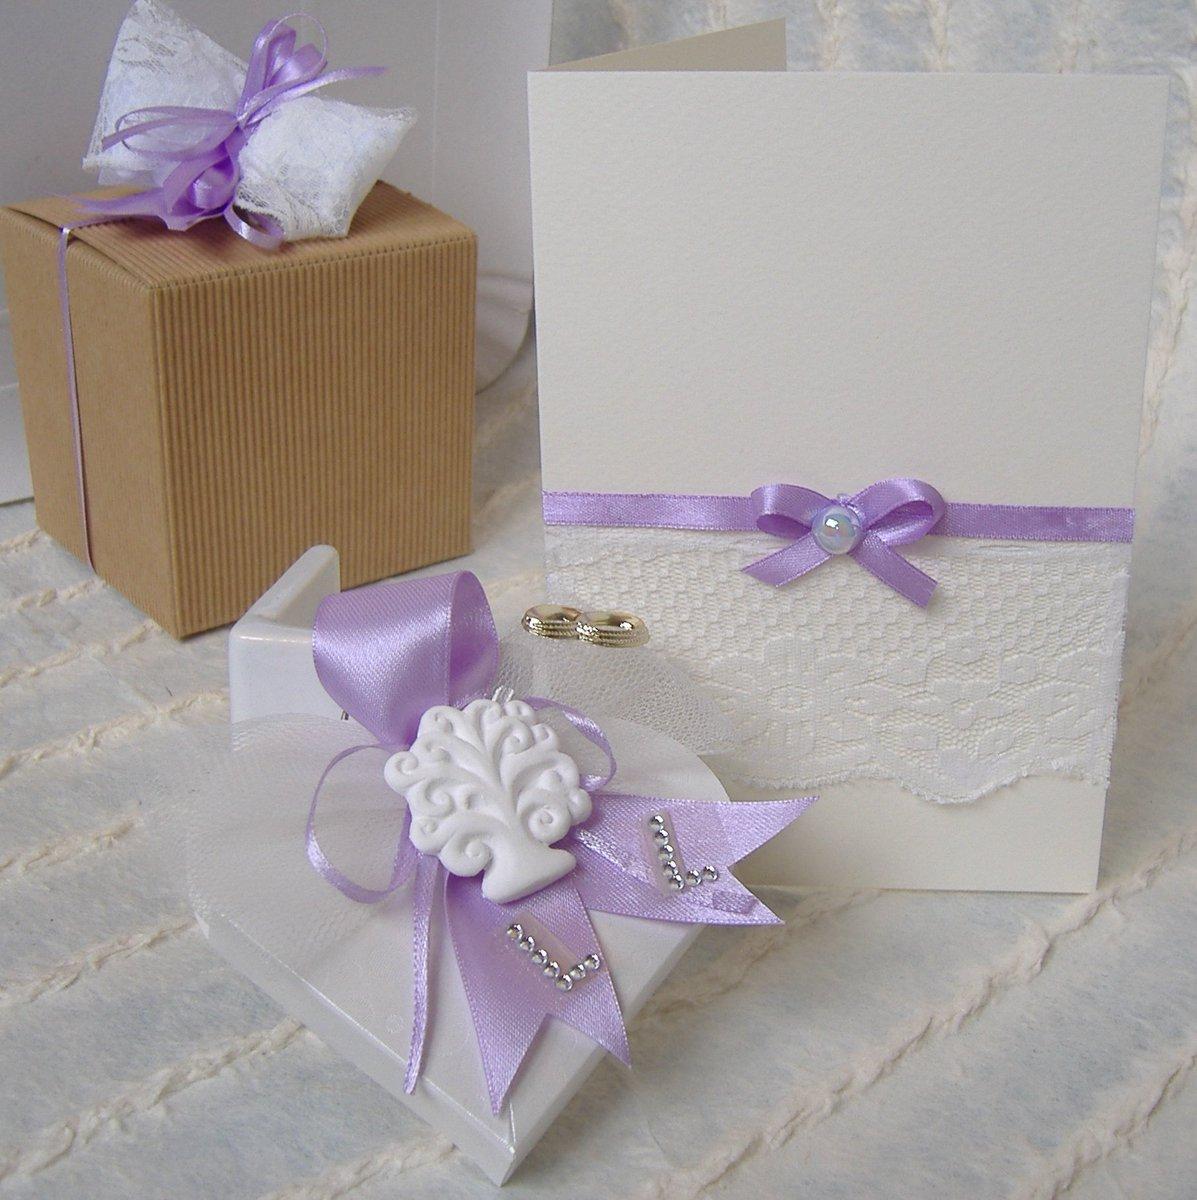 Partecipazioni Matrimonio Glicine.Tigerbazar Hobbyshopbomboniere It Bonbon Craft Twitterissa